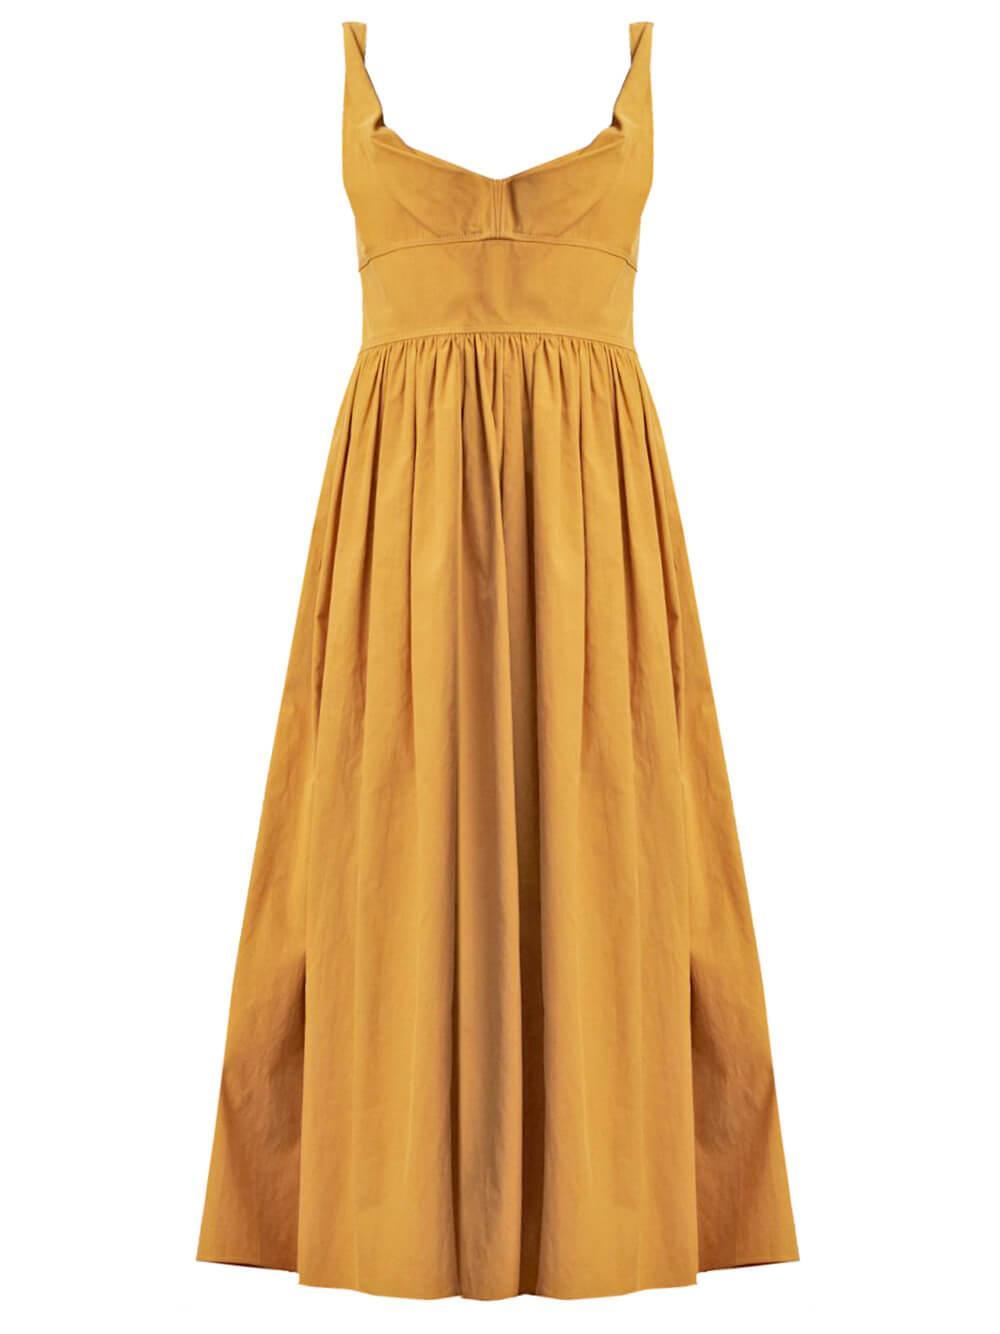 Slub Sateen Dress Item # 621170D907